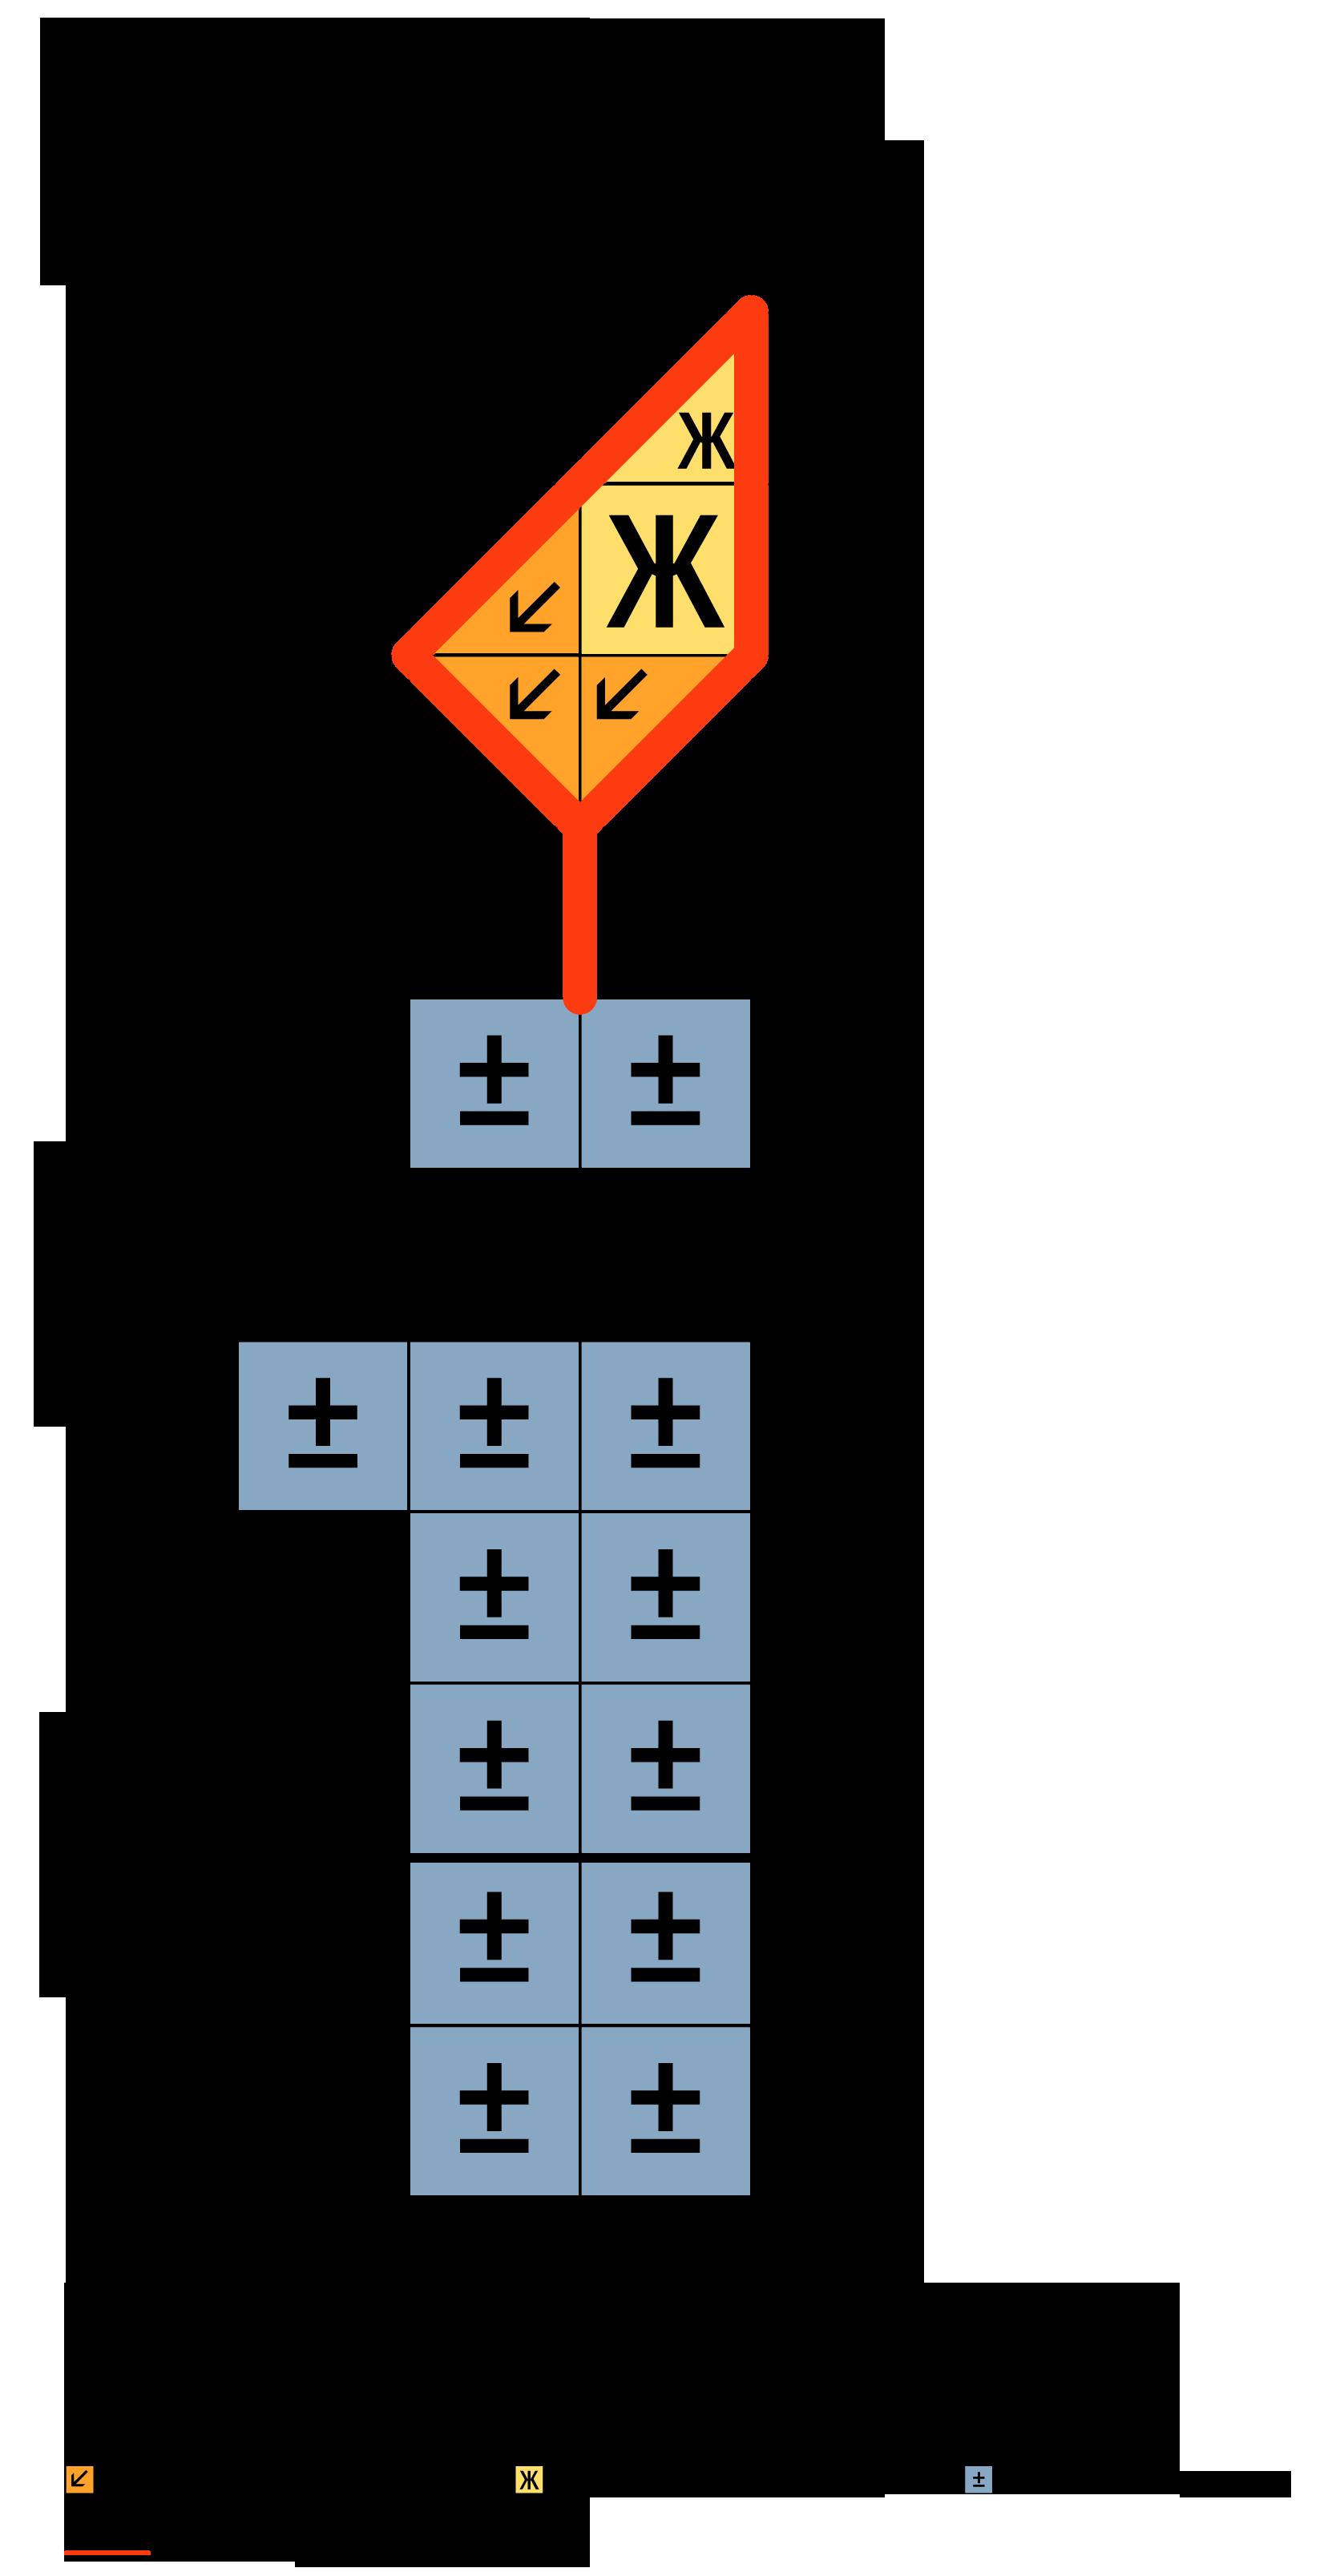 alfabeto candeline I